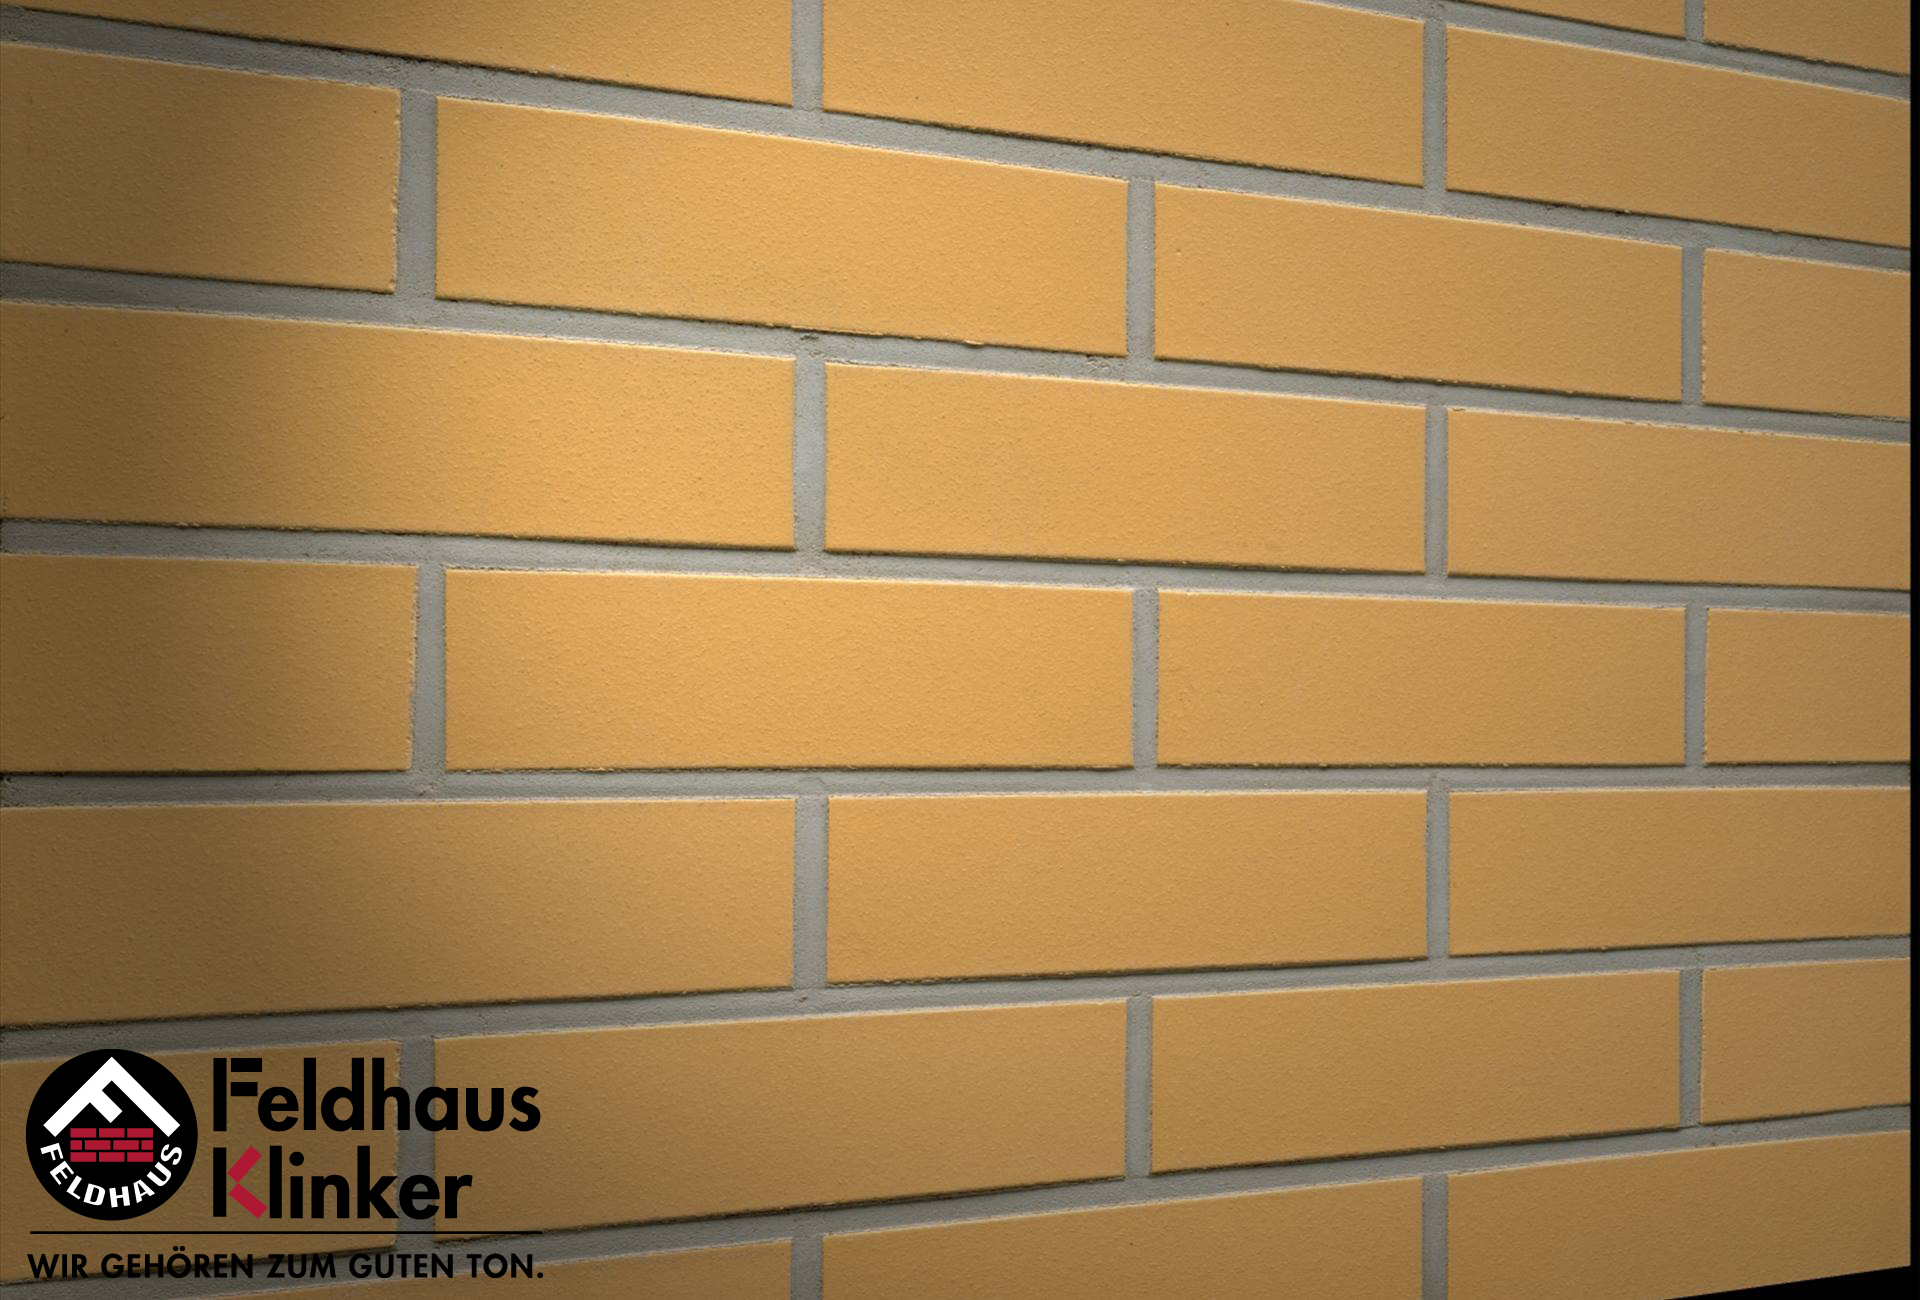 R200 Feldhaus Klinker клинкерная плитка 1